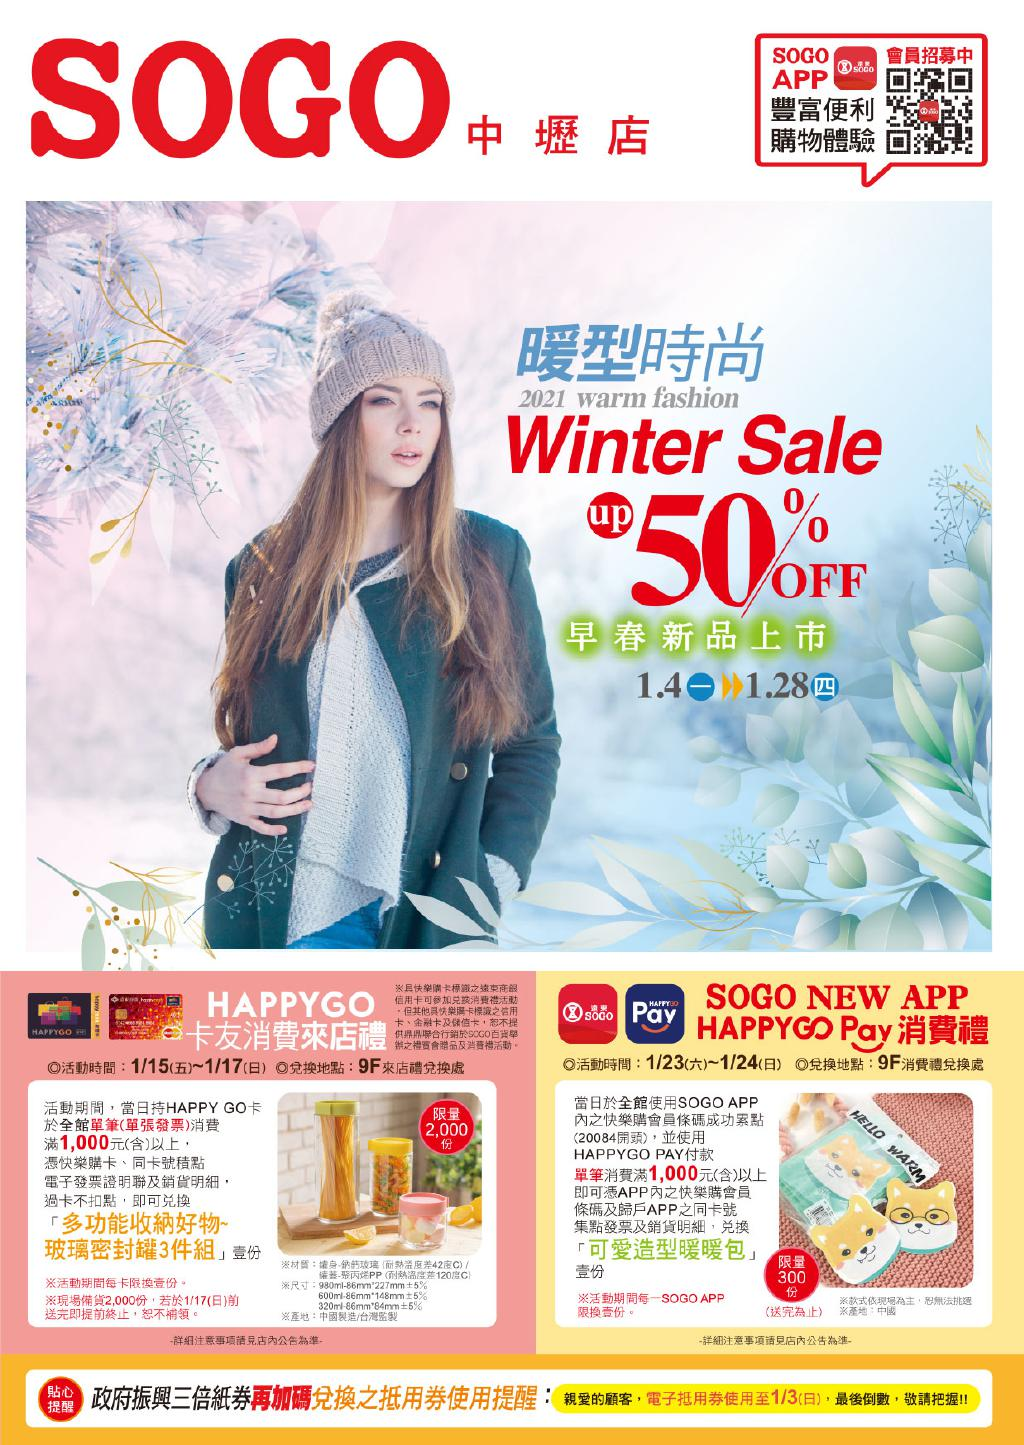 SOGO《中壢店》DM「暖型時尚 Winter Sale up 50% OFF 、早春新品上市」 【2021/1/28 止】